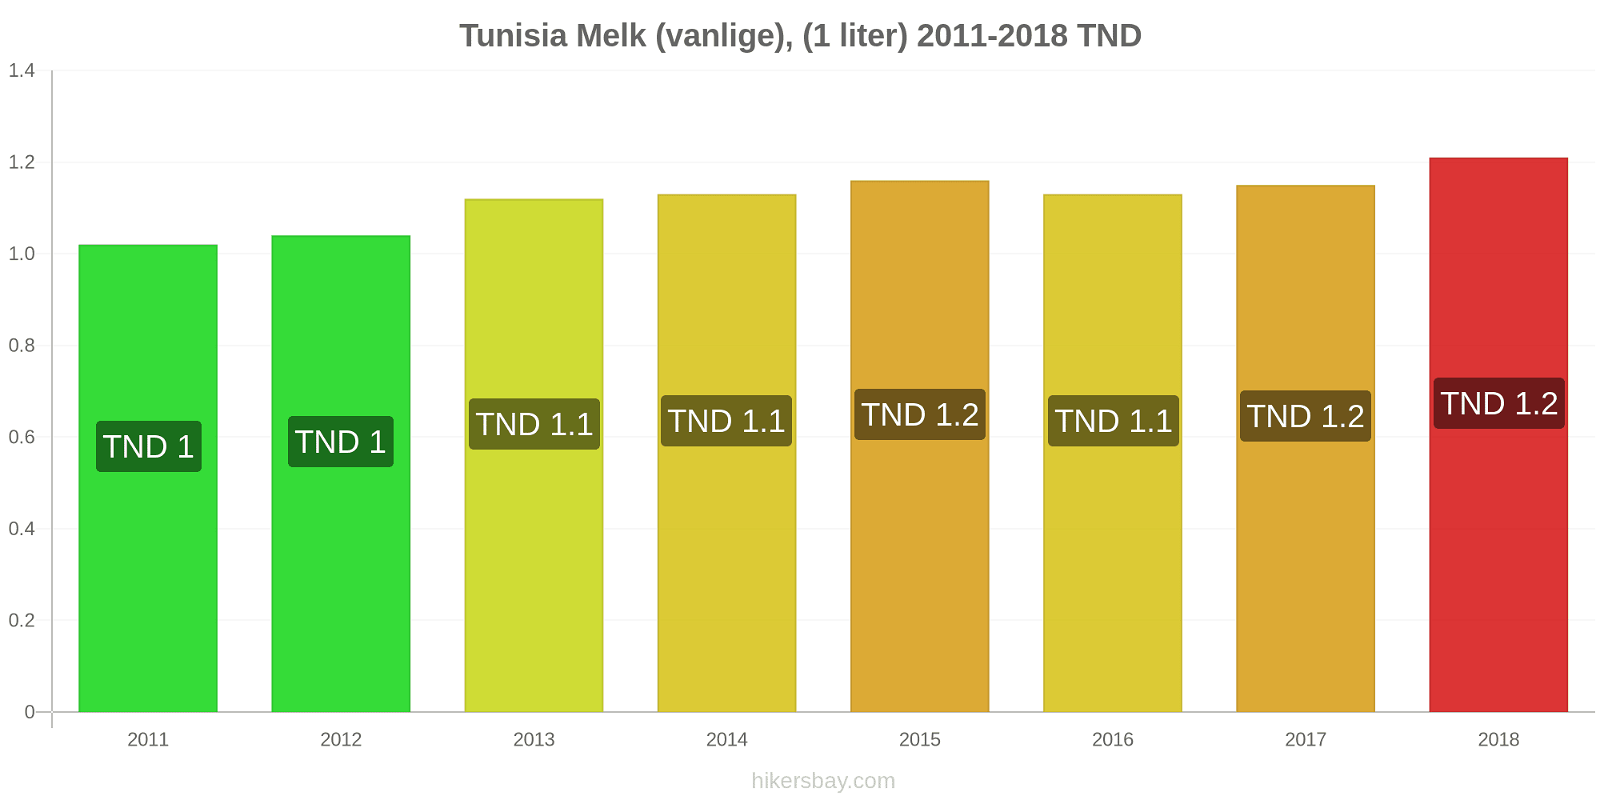 Tunisia prisendringer Melk (vanlige), (1 liter) hikersbay.com